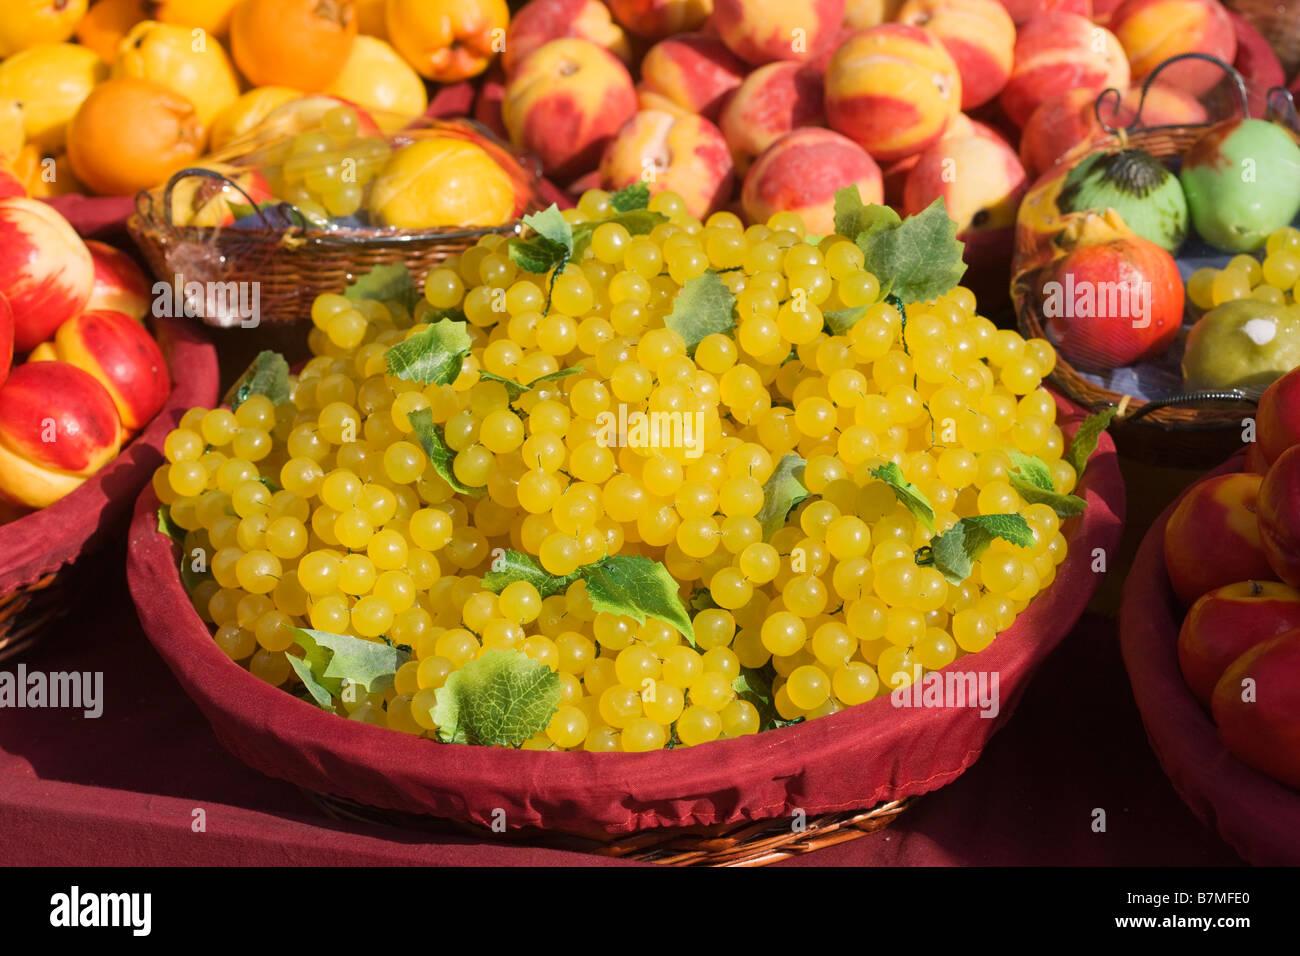 Plastic Fruit Display Grapes Stock Photos & Plastic Fruit